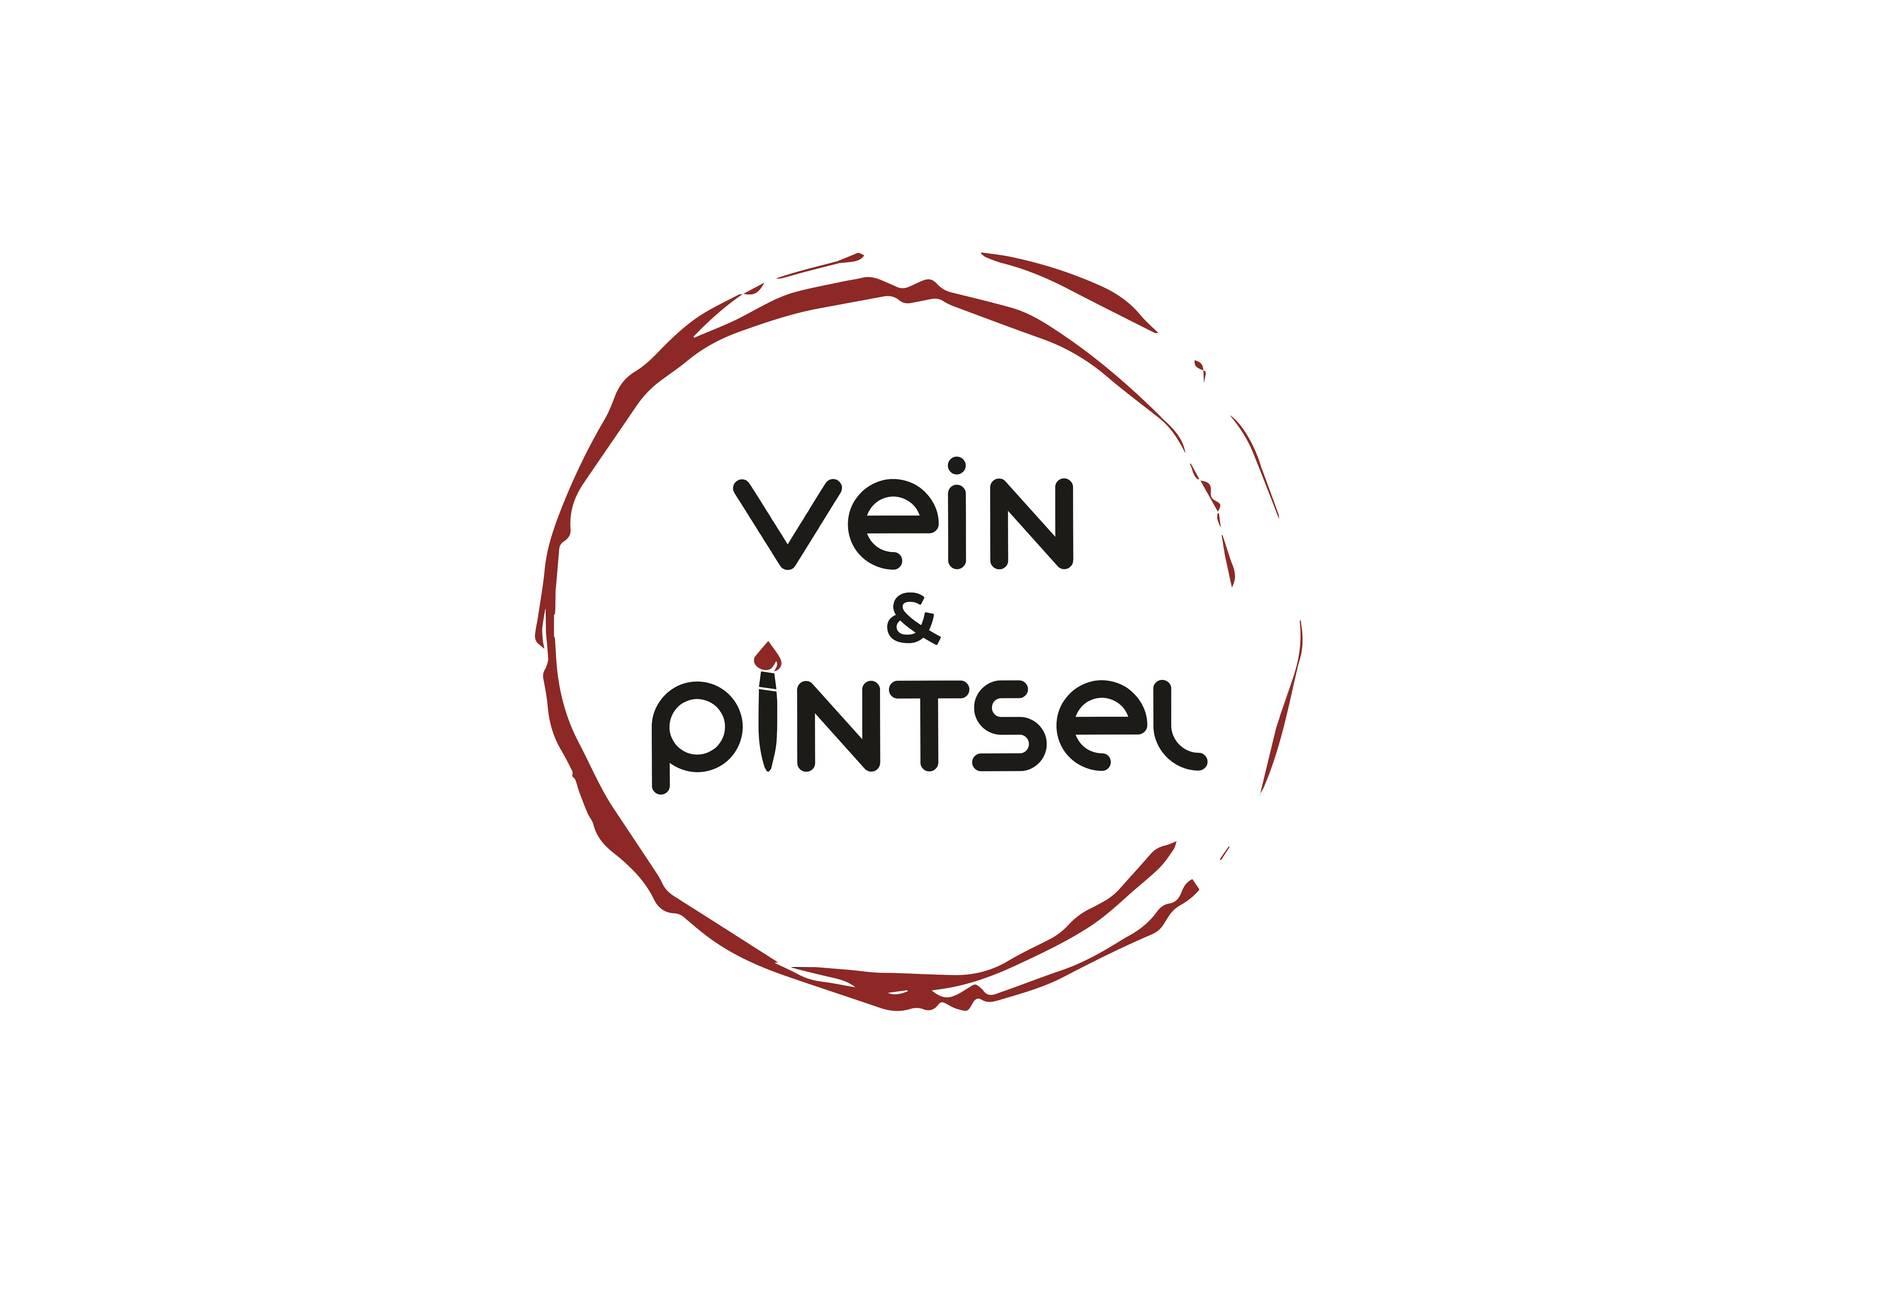 Vein & Pintsel logo 2020